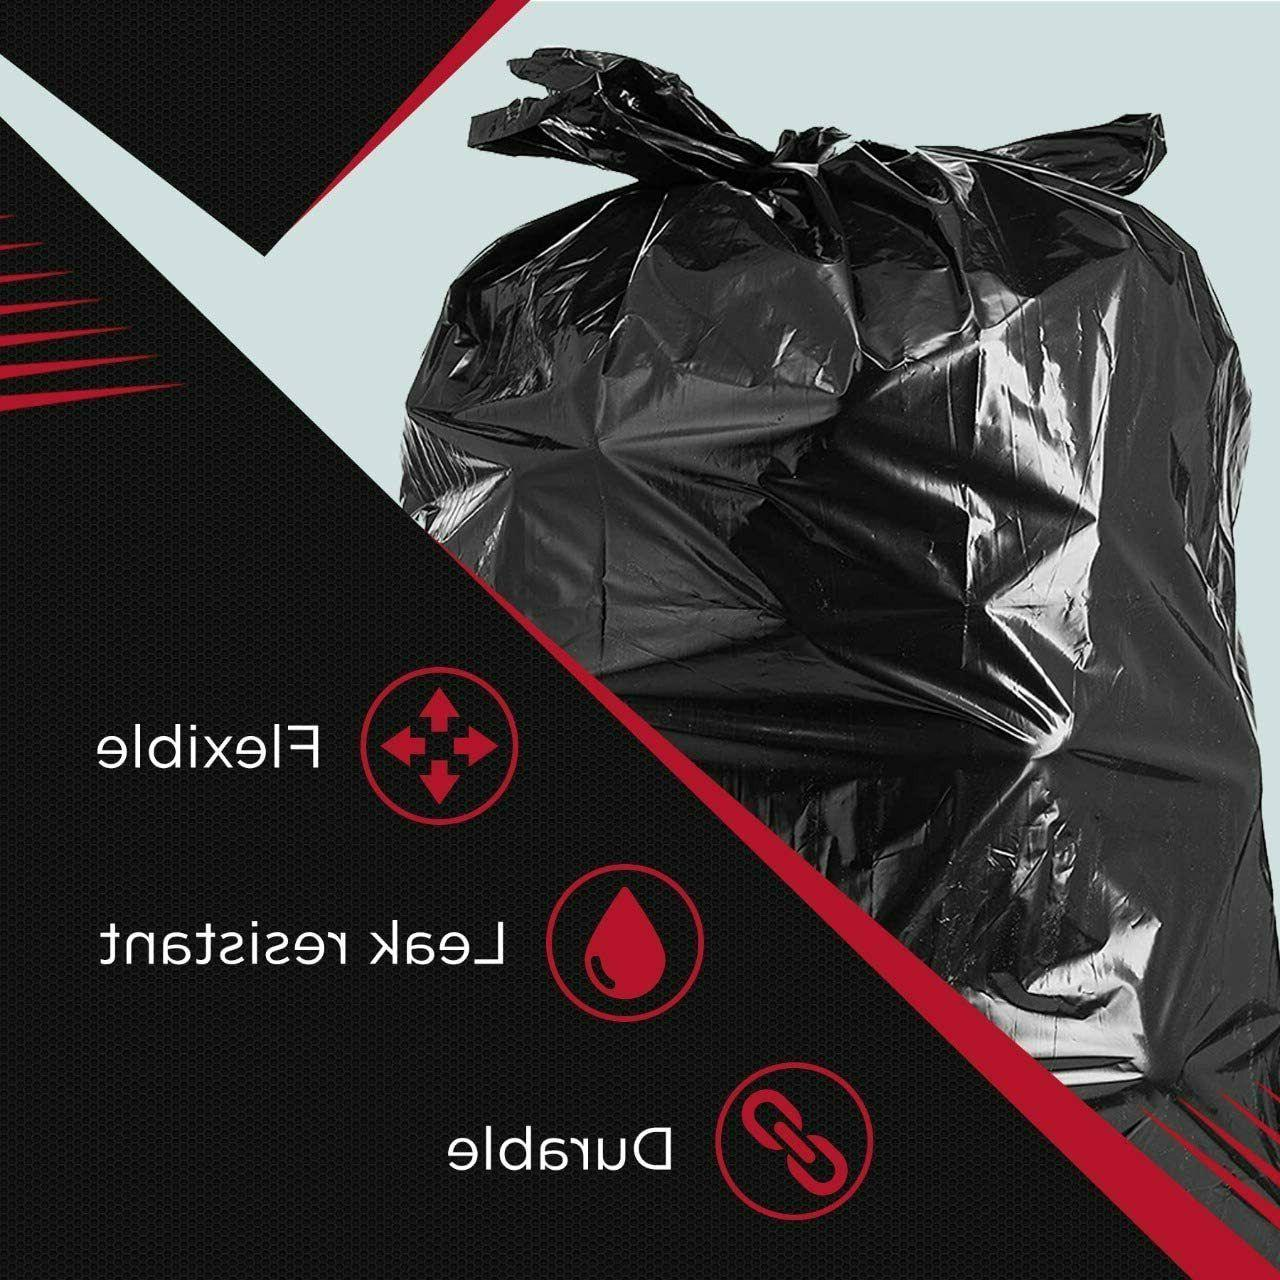 96 Gallon Trash Can Outdoor Bin